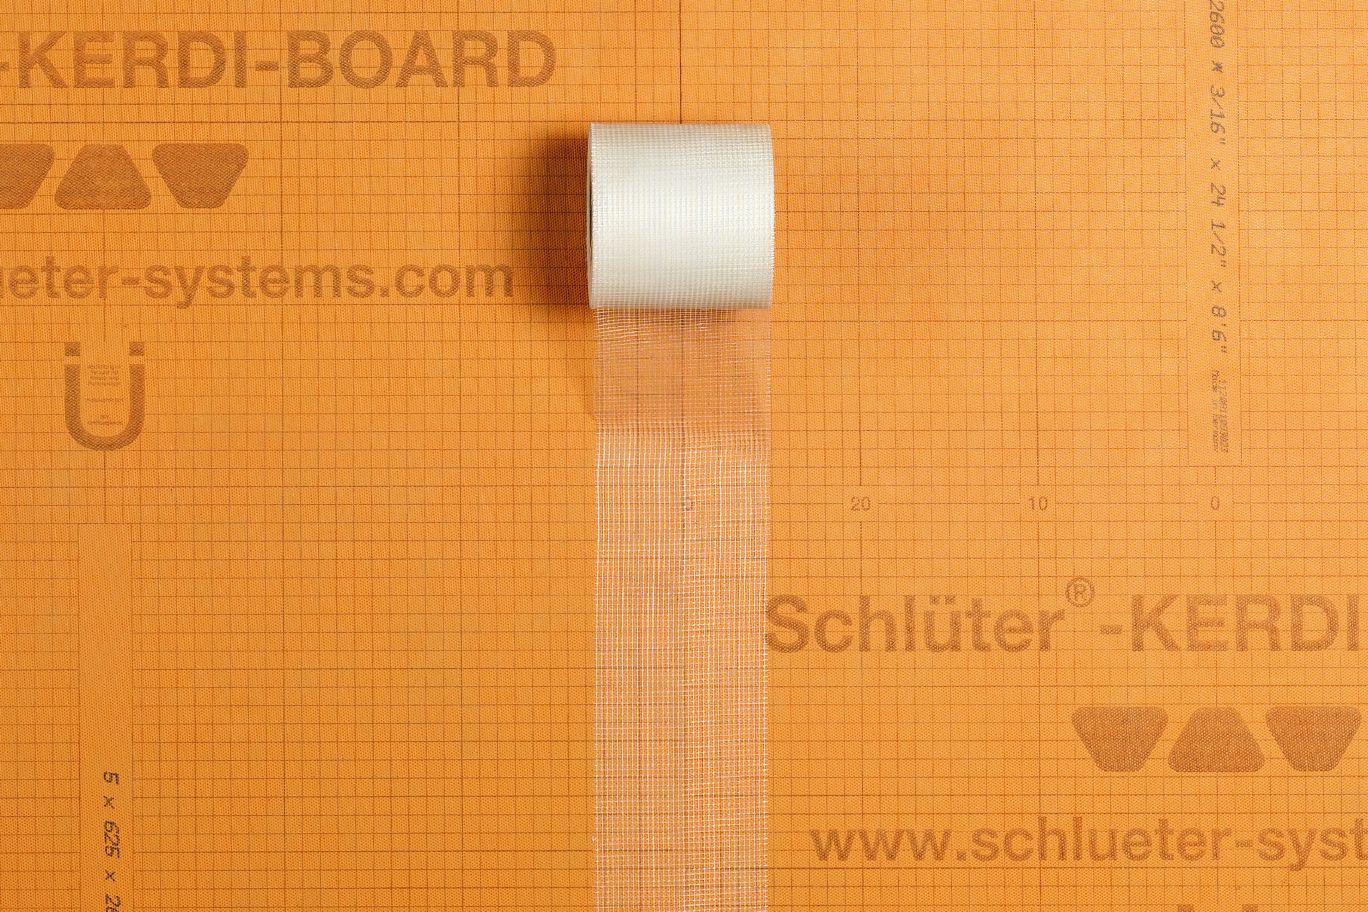 Schluter®-KERDI-BOARD-ZSA